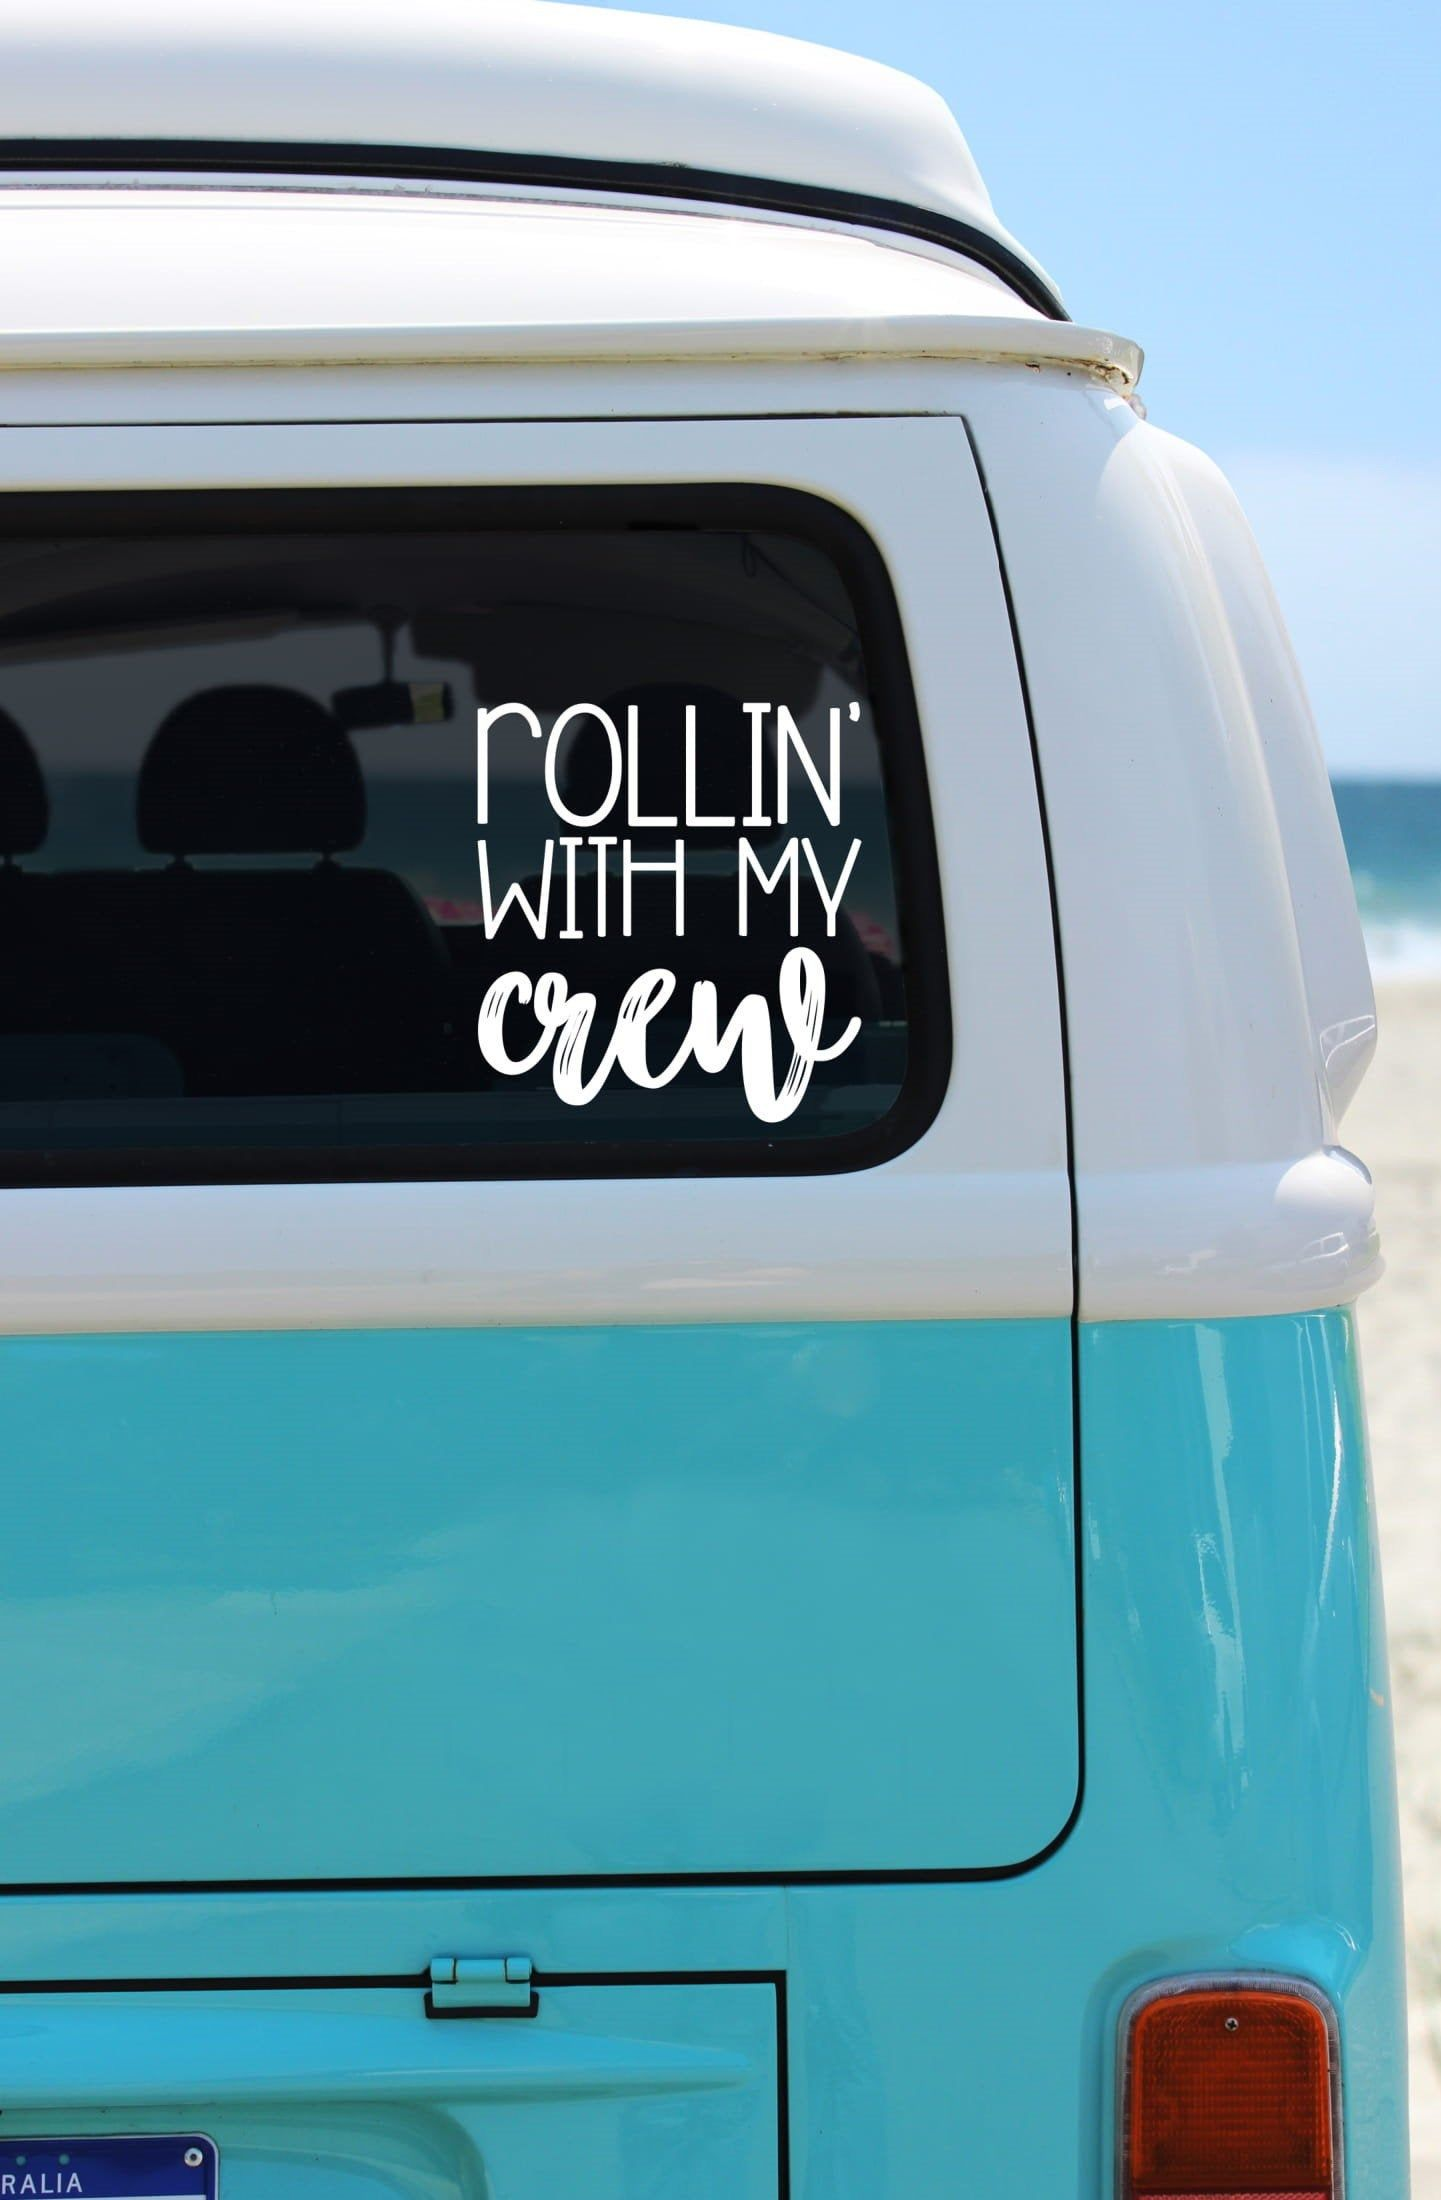 Rollin With My Crew Car Decal Car Sticker Mom Van Decal Mom Sticker Window Decal Window Sticker Window Vinyl Mo Mom Car Car Stickers Car Stickers Funny [ 2200 x 1441 Pixel ]